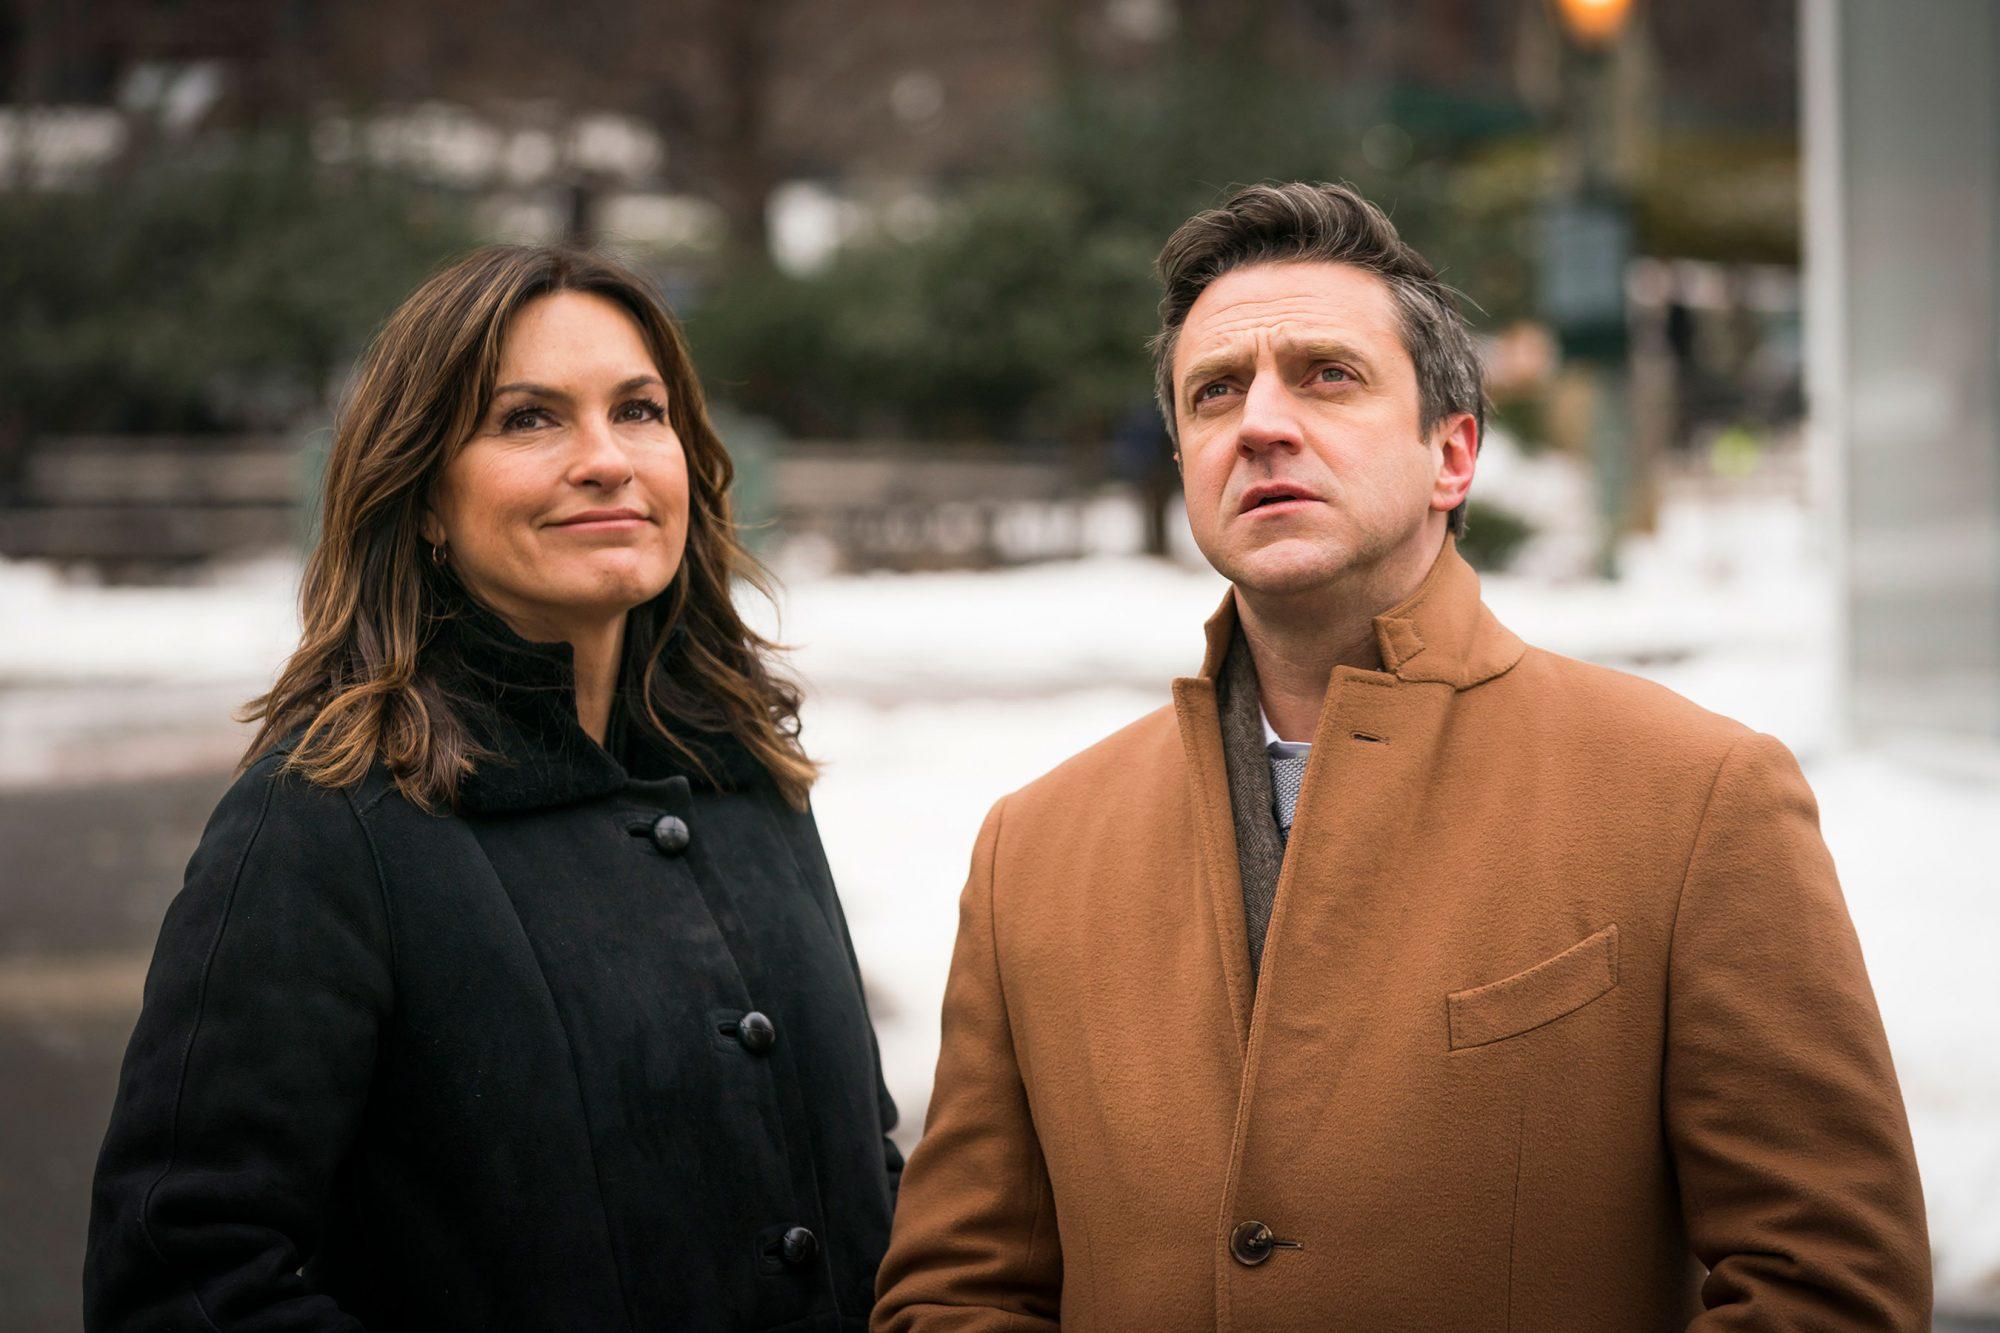 Michael Parmelee/NBC